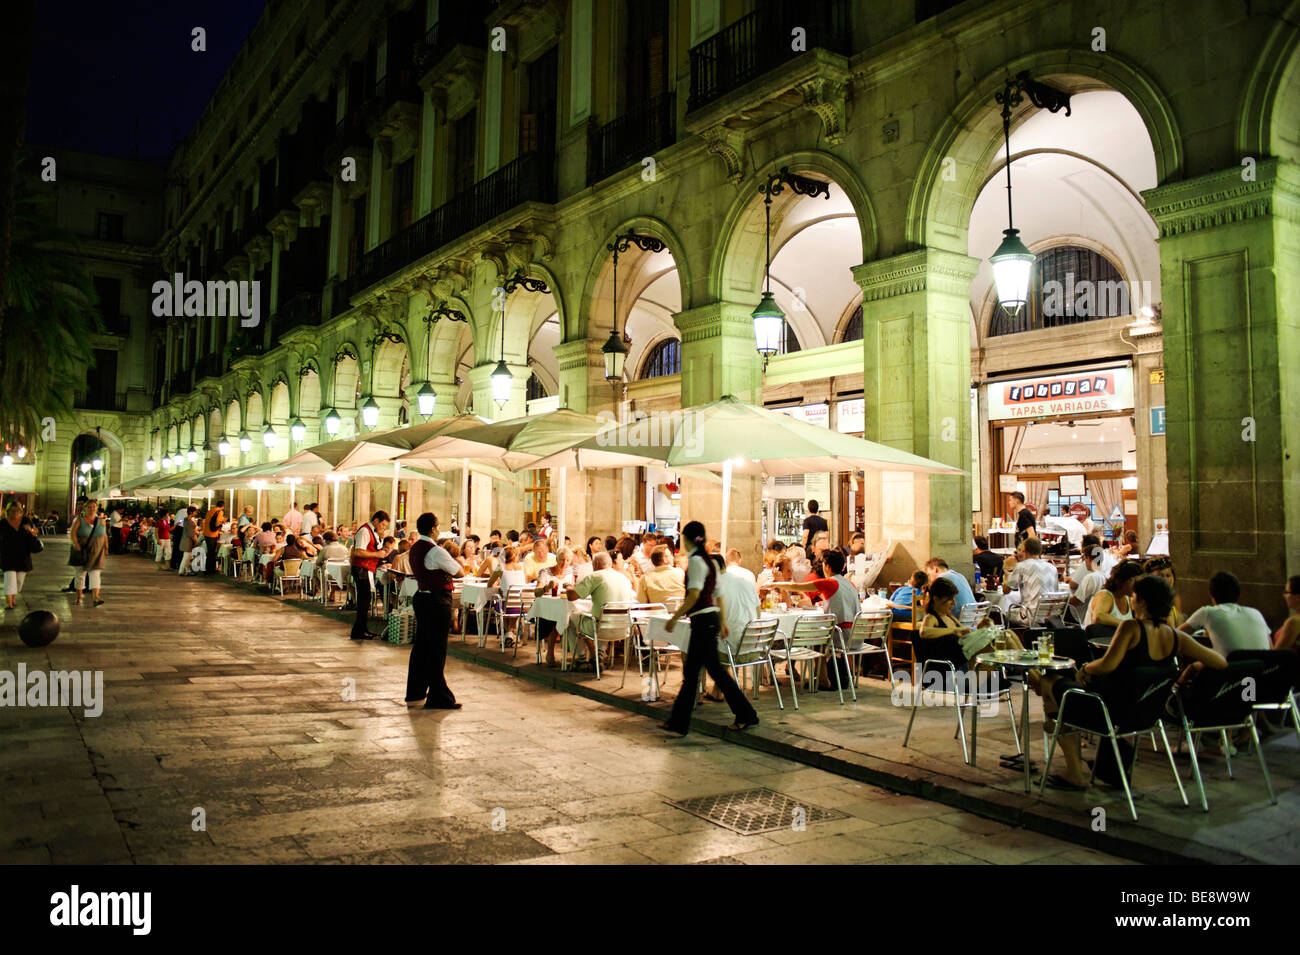 Alfresco dining on Plaza Reial. Barcelona. Spain - Stock Image